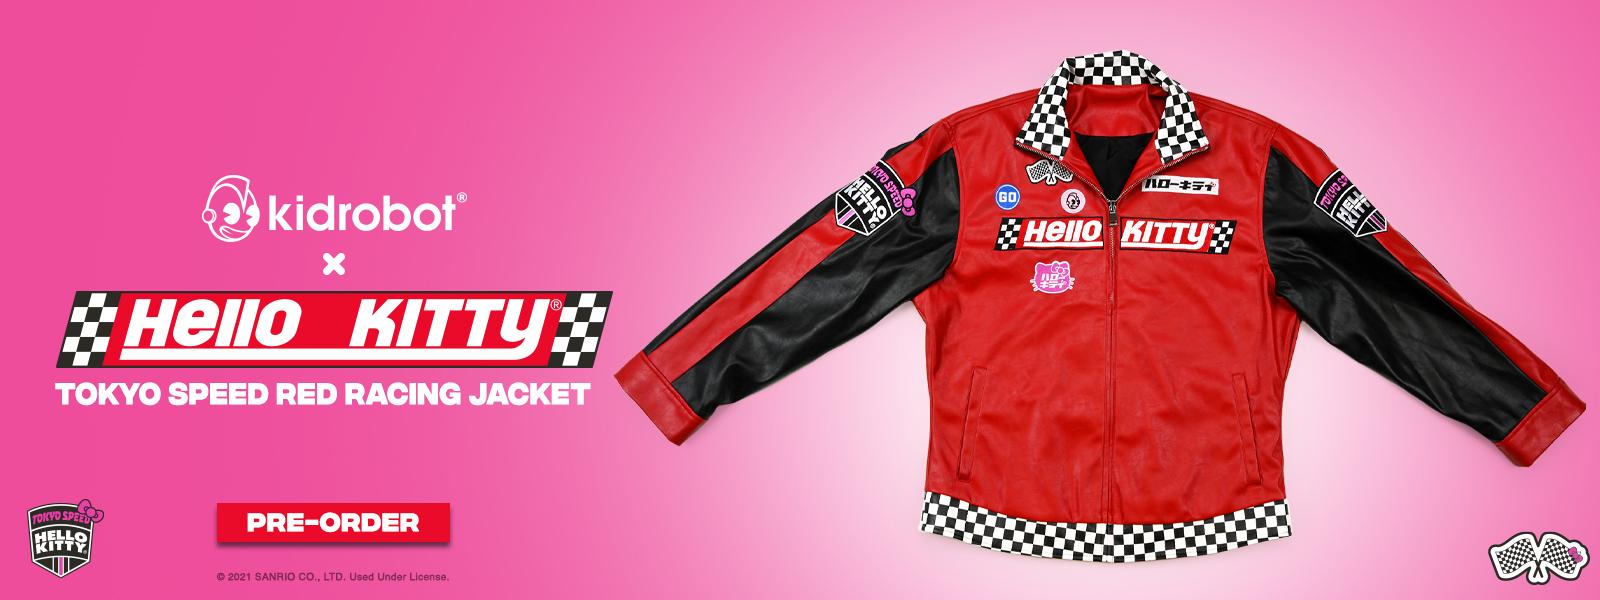 Race for the finish line in Kidrobot's Hello Kitty® Tokyo Speed moto jacket!